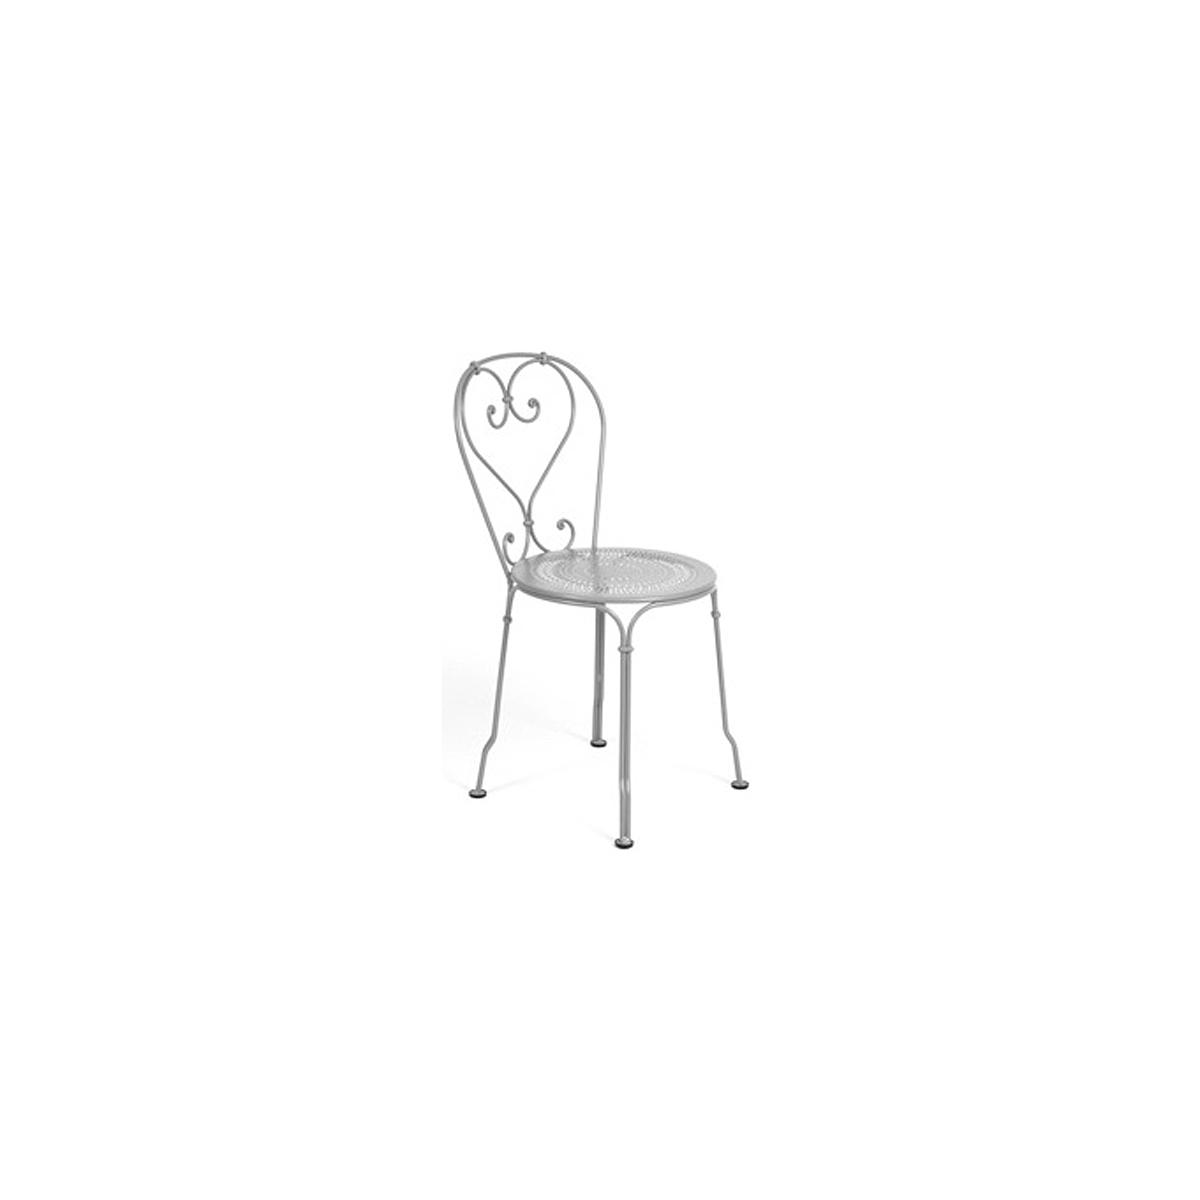 1900 by Fermob Chaise gris métal